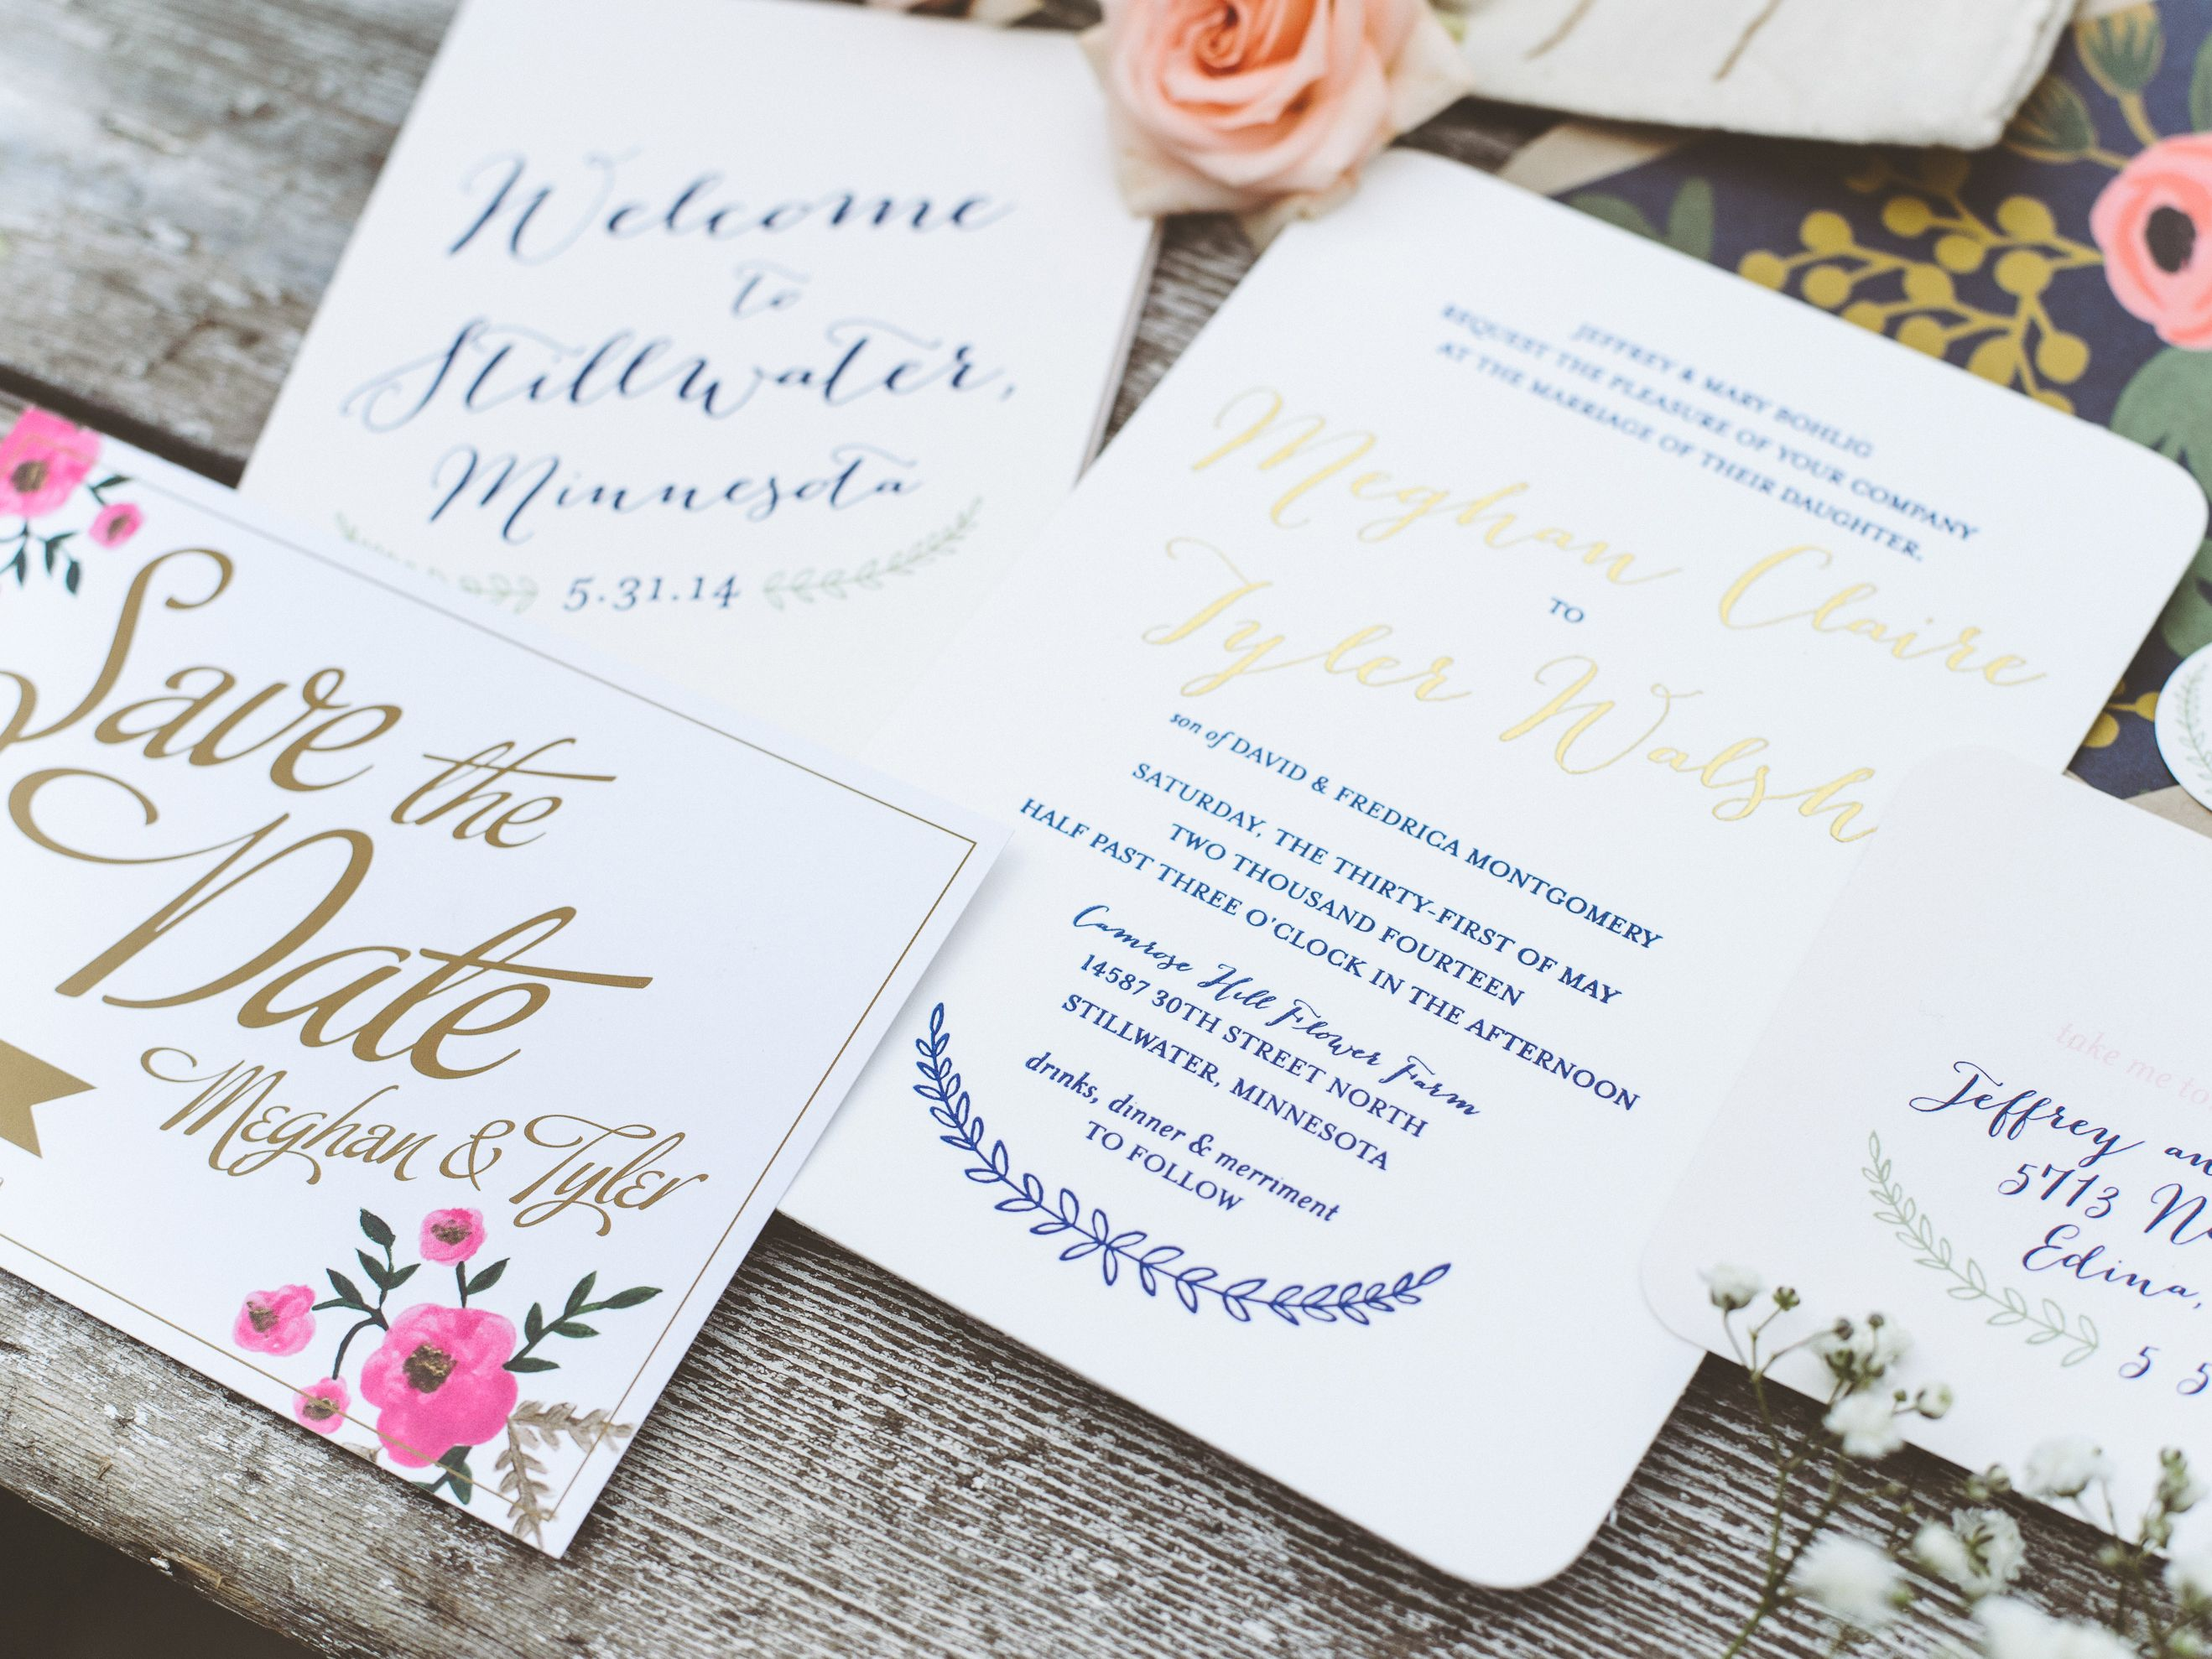 Wedding Invitation Wording Samples | Wedding, Wedding and ...